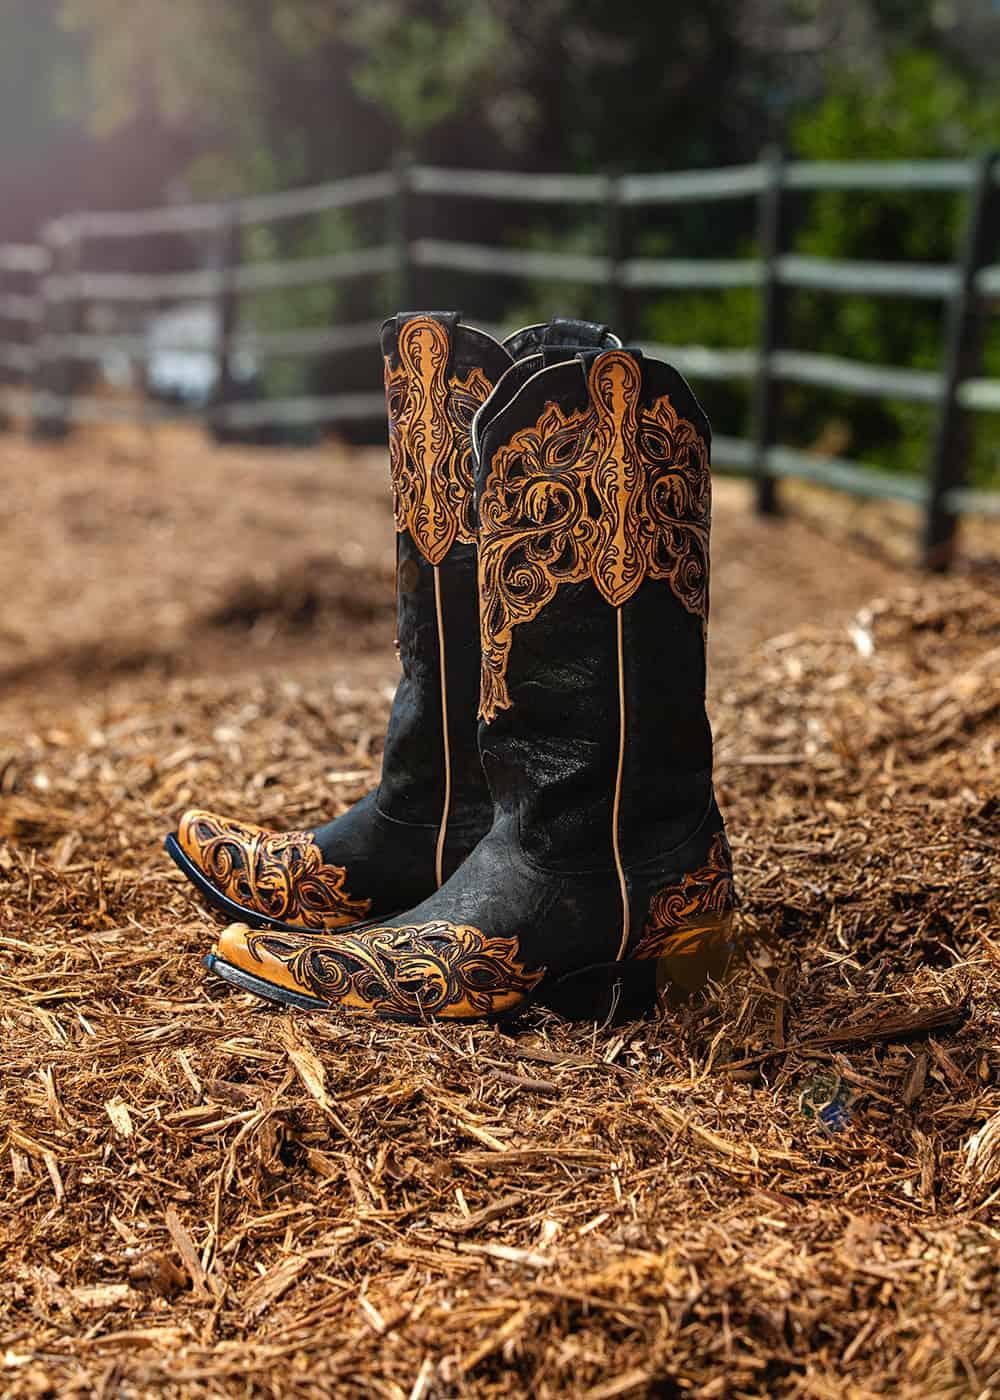 mackenzie boot yippee ki yay old gringo cowgirl magazine